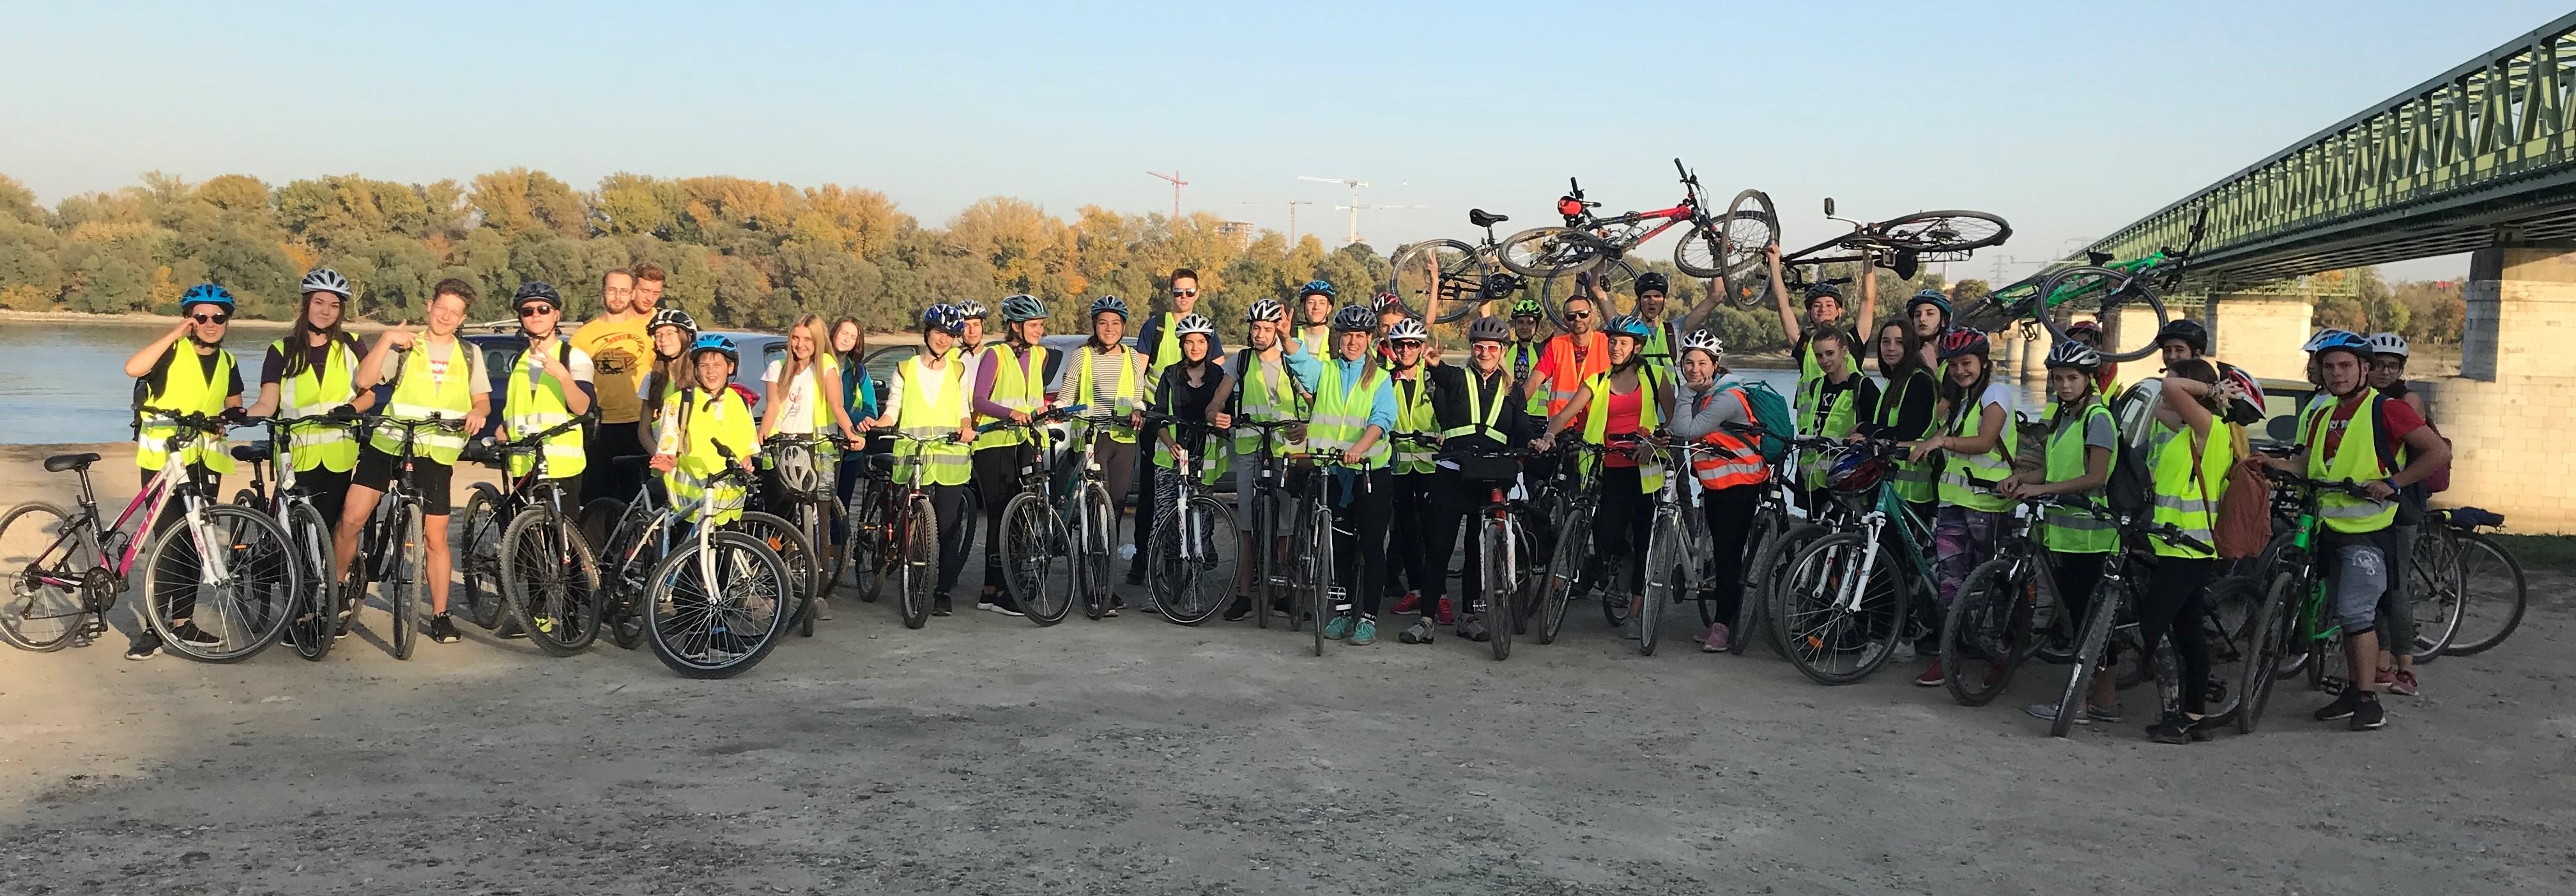 biketour to Szentendre